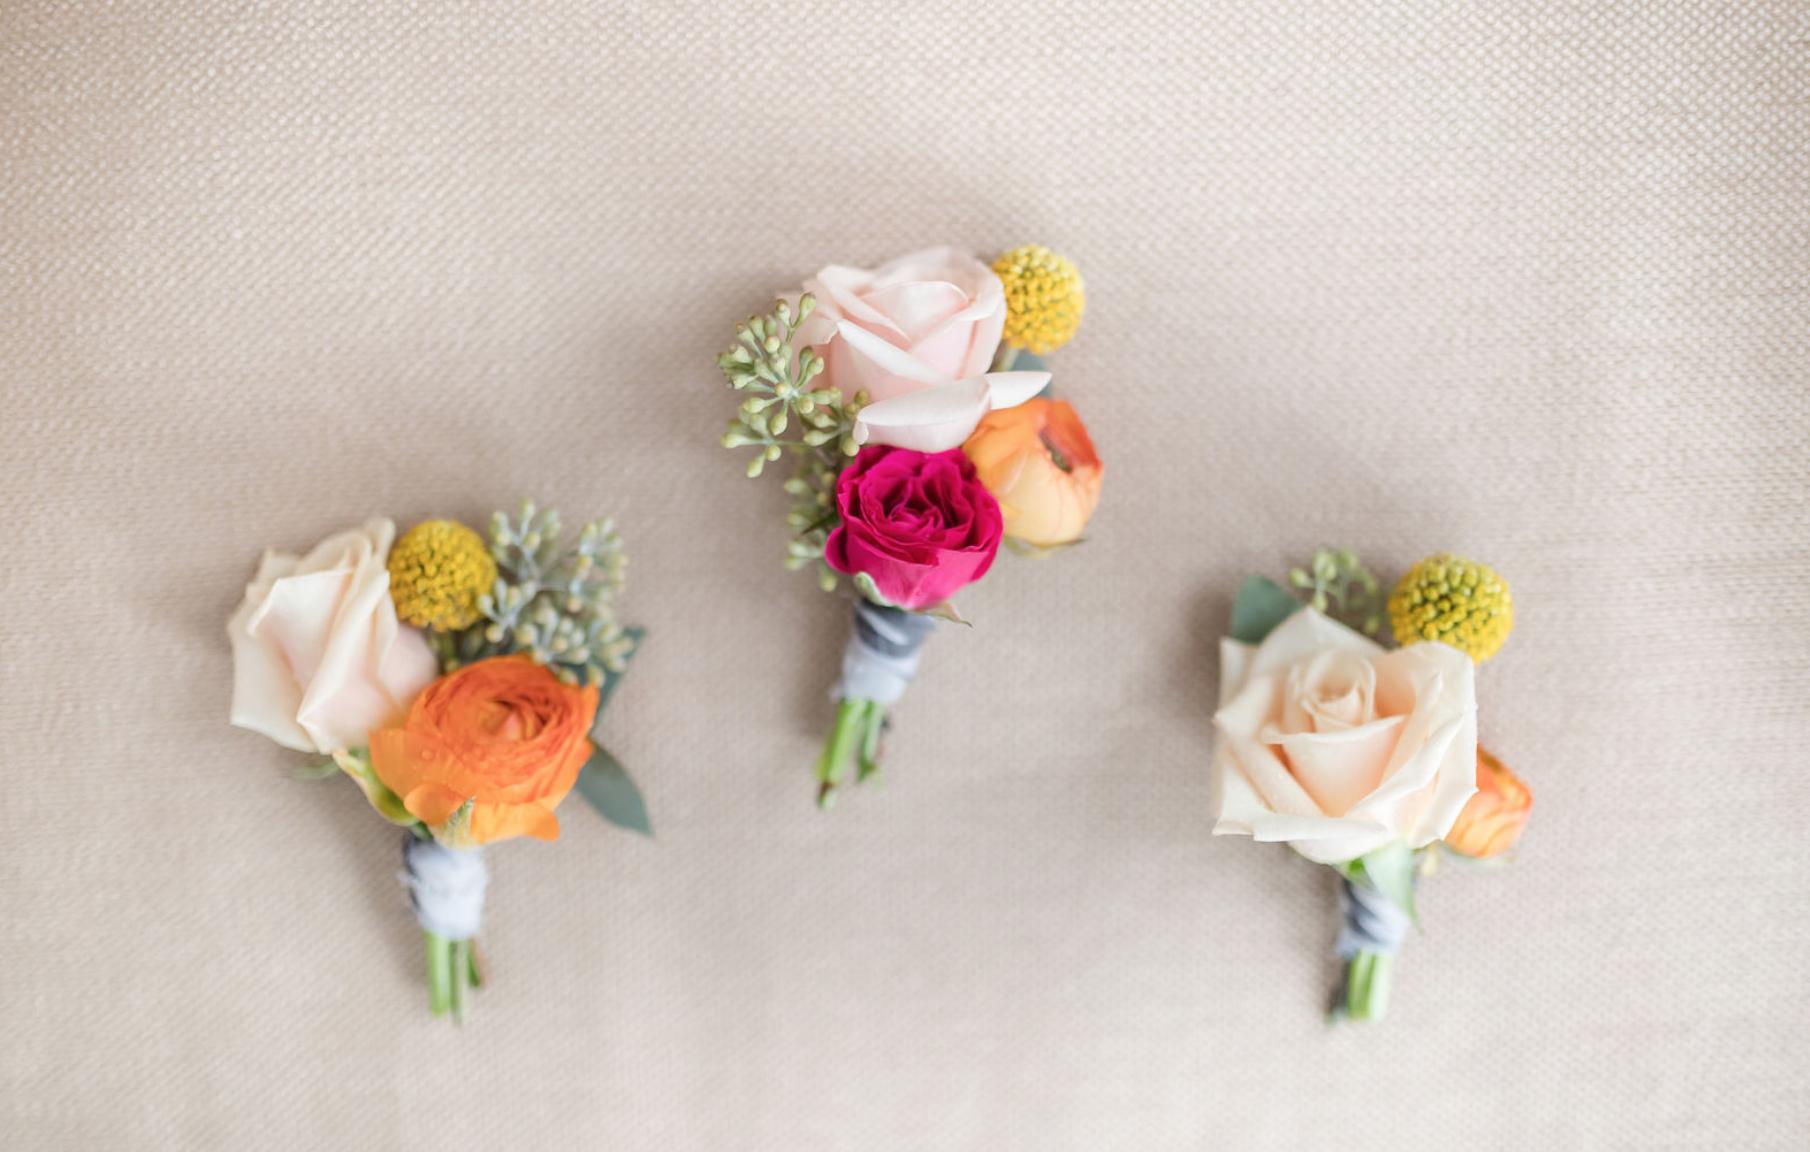 ivory_and_beau_savannah_bridal_shop_ivory_and_beau_floweres_savannah_florist_spring_wedding_savannah_wedding_gowns_savannah_wedding_dresses_southern_bride_4.png